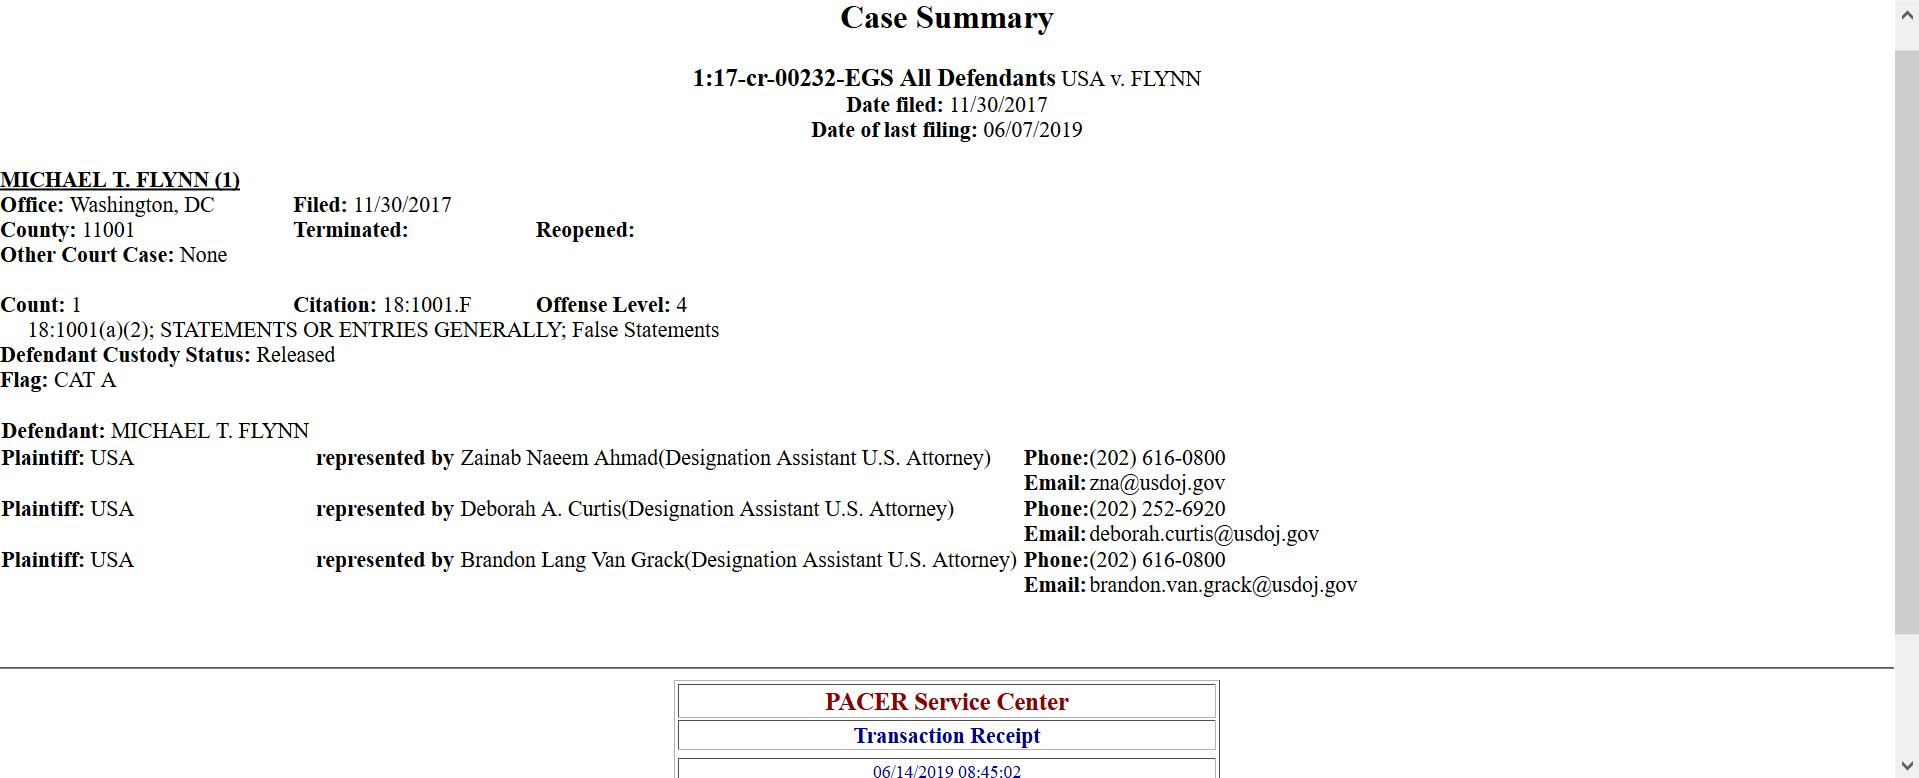 Flynn docket entries deborah curtis.png